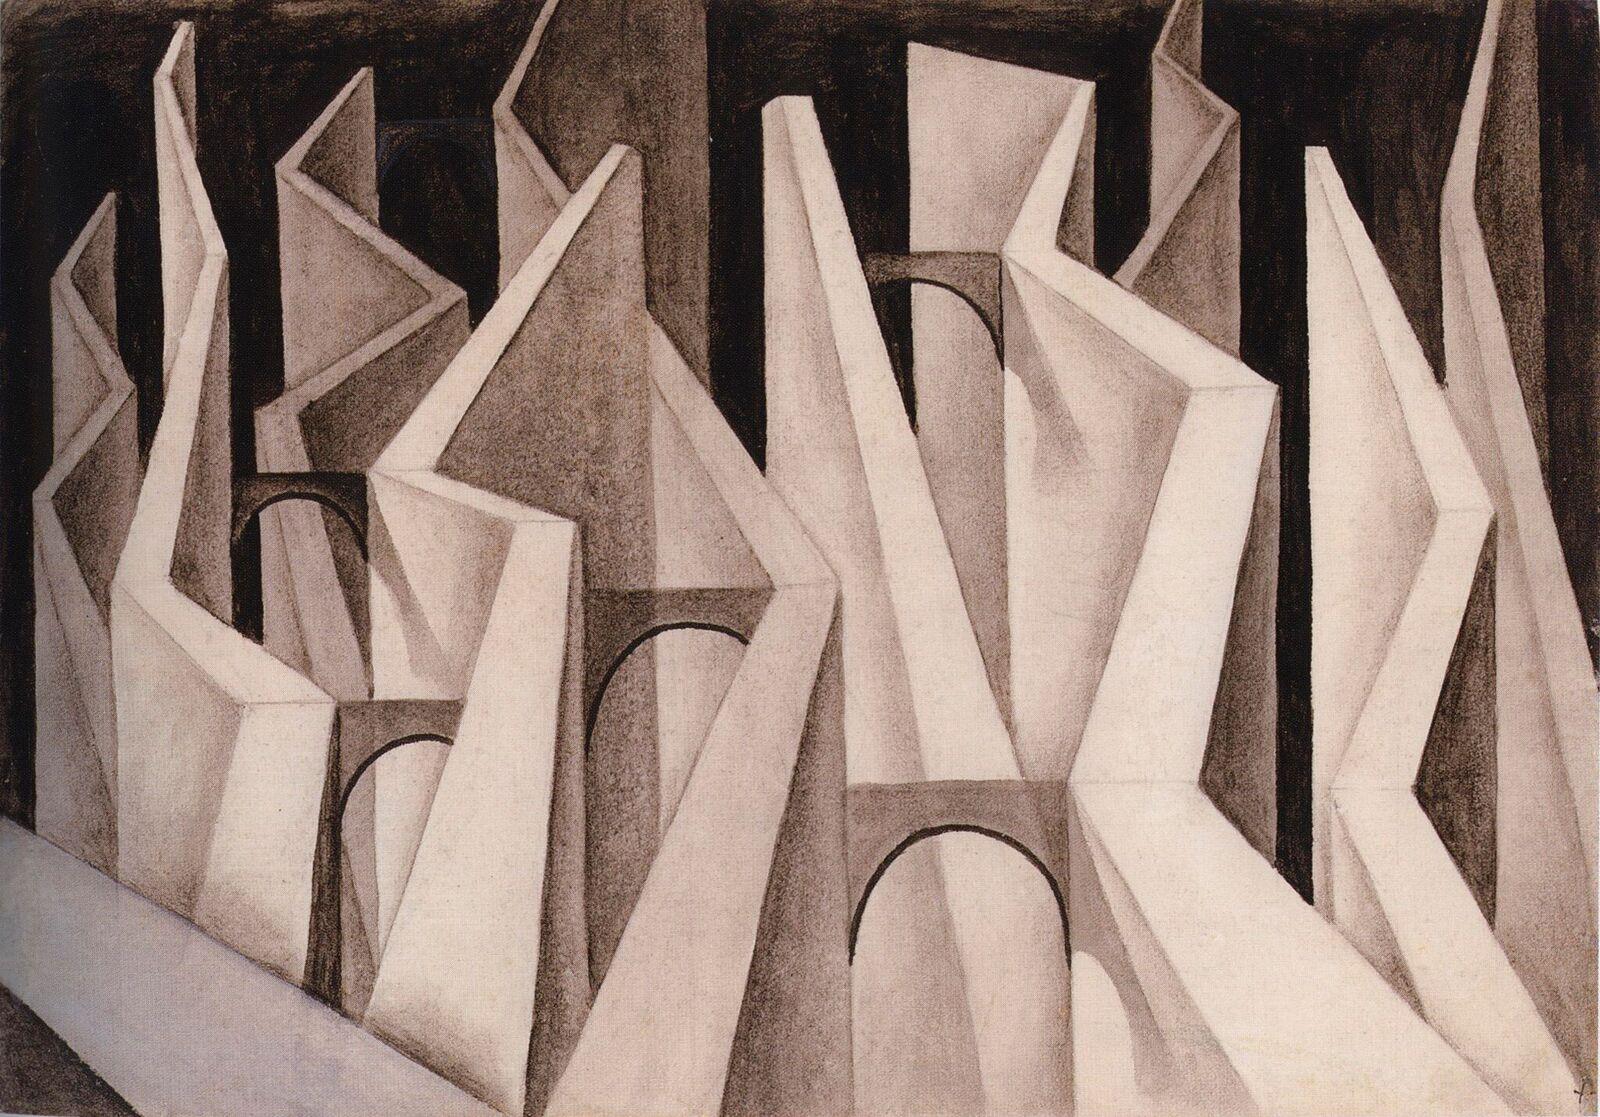 Alejandro Xul Solar (1887-1963)   Muros , 1944  tempera on paper 13 1/2 x 19 5/8 inches; 34.3 x 49.8 centimeters